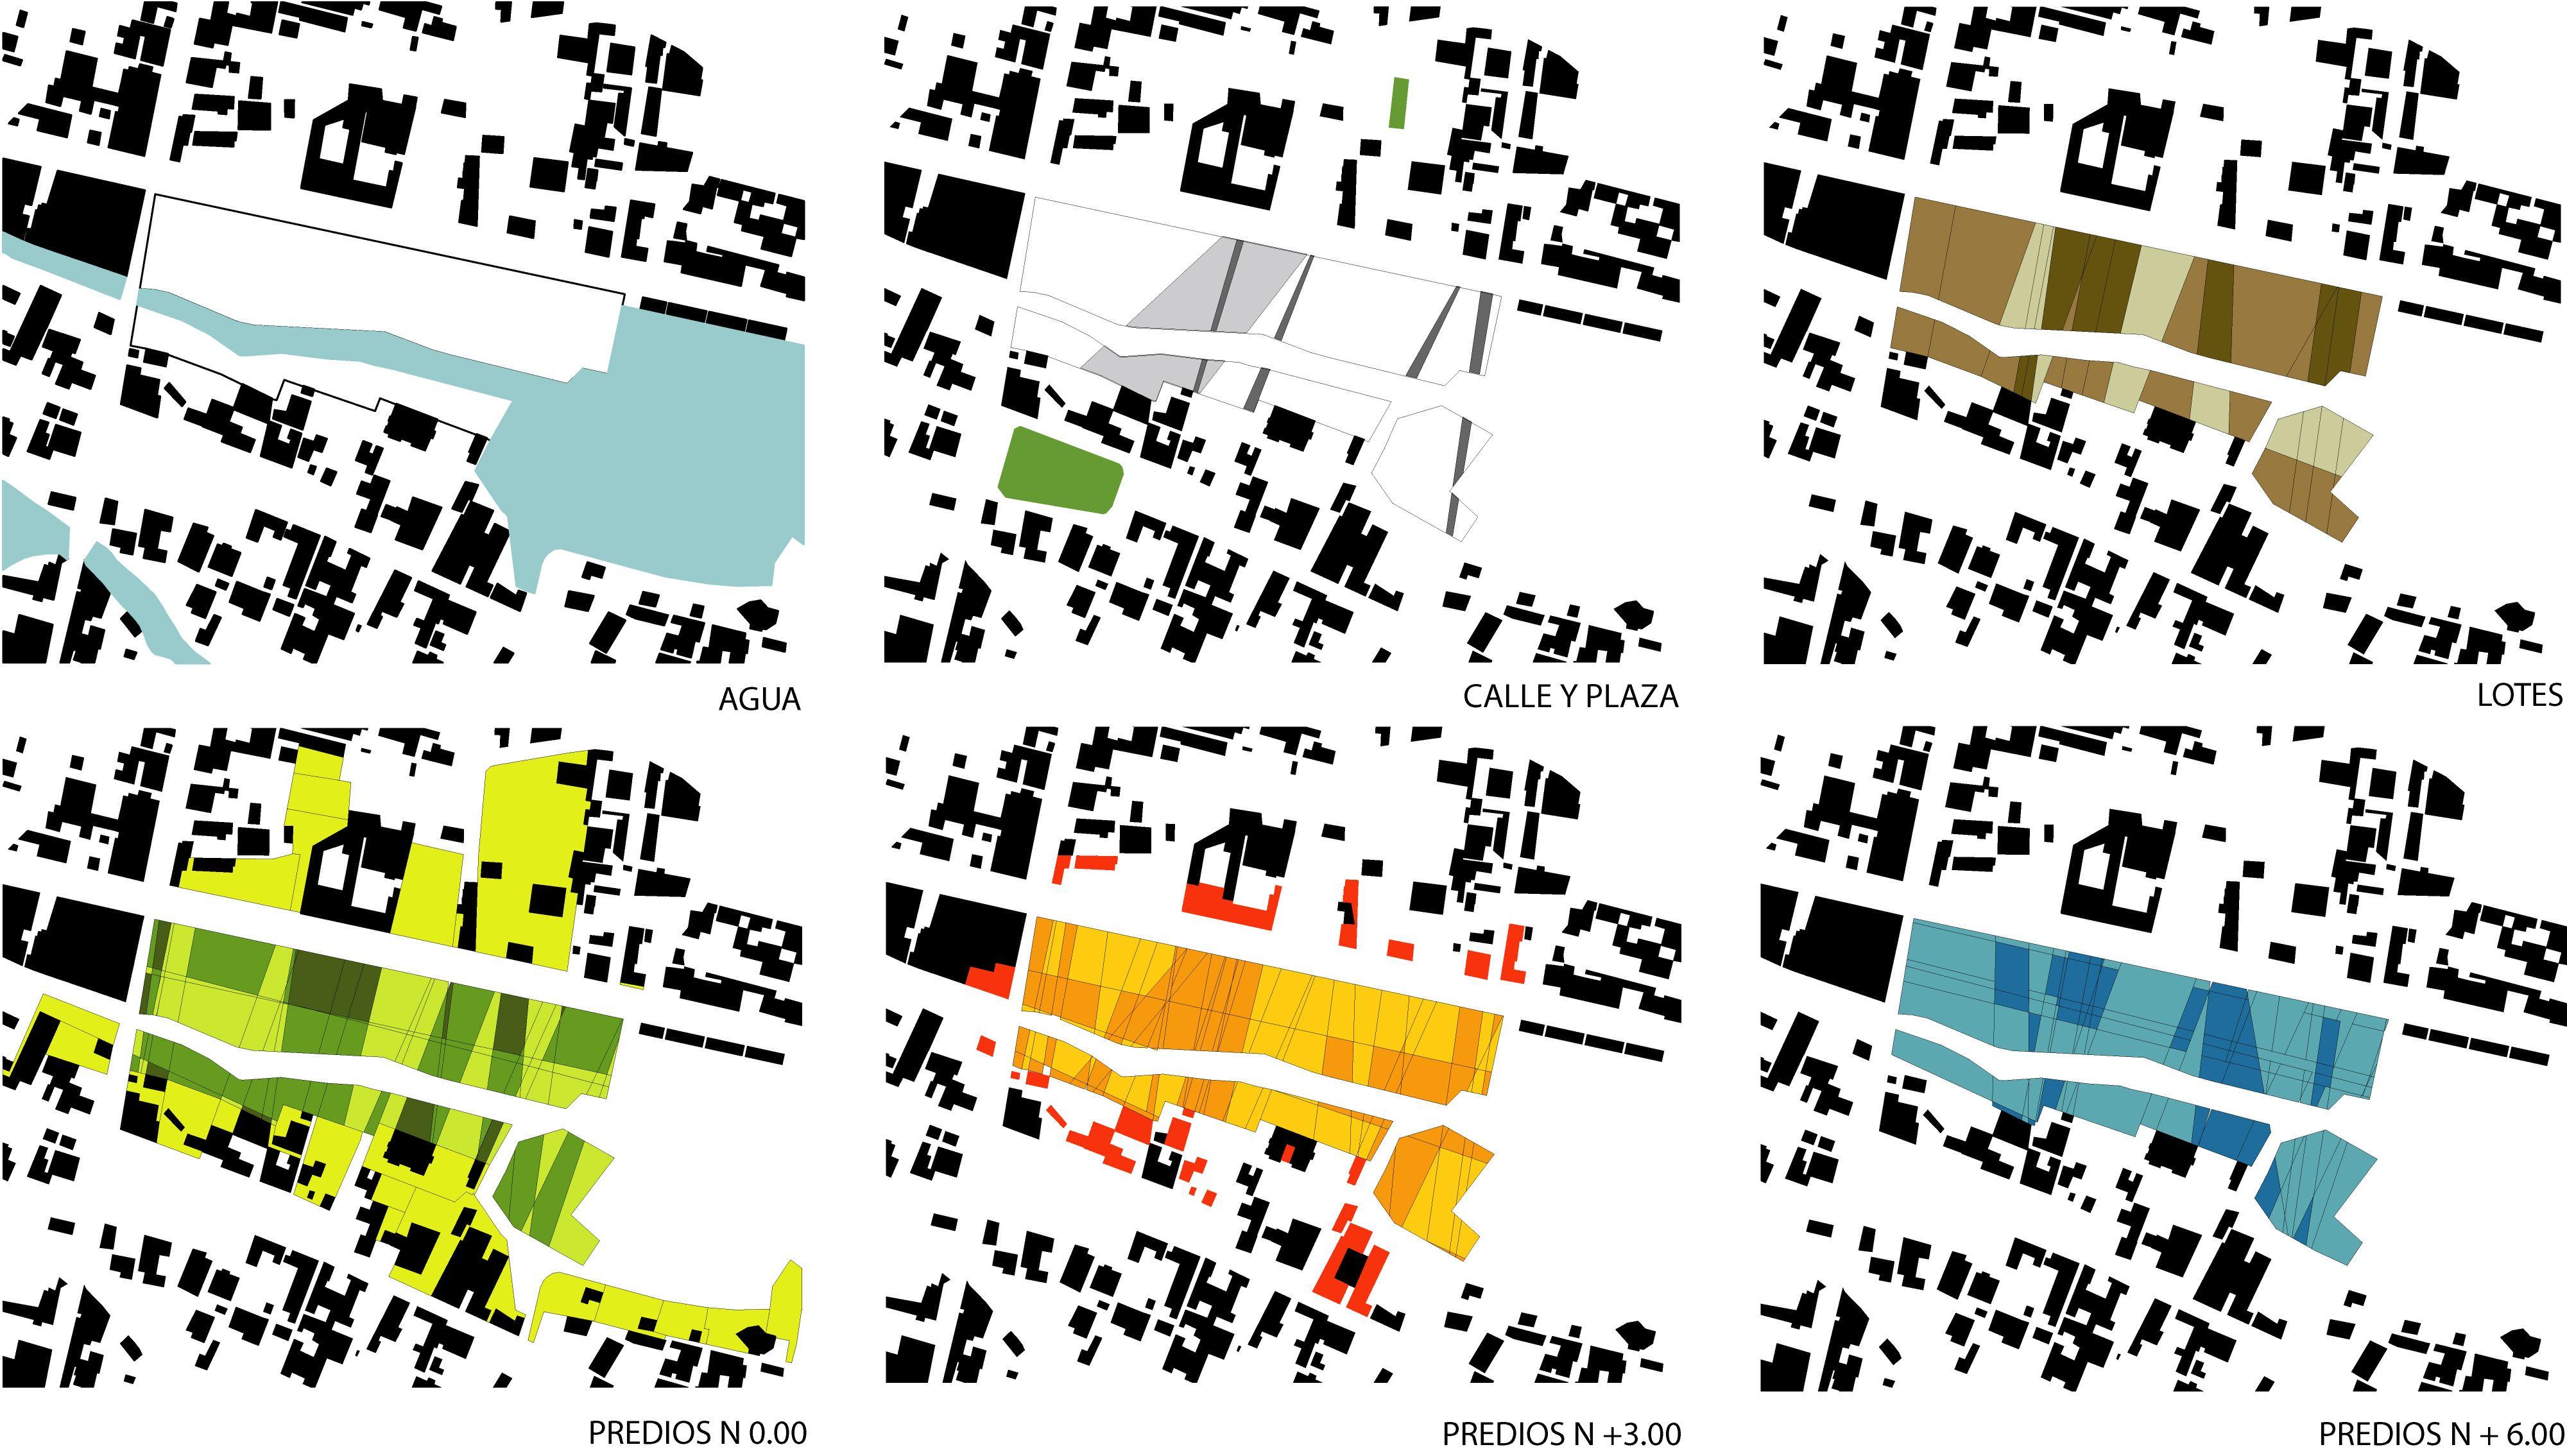 Urban Design Diagrams